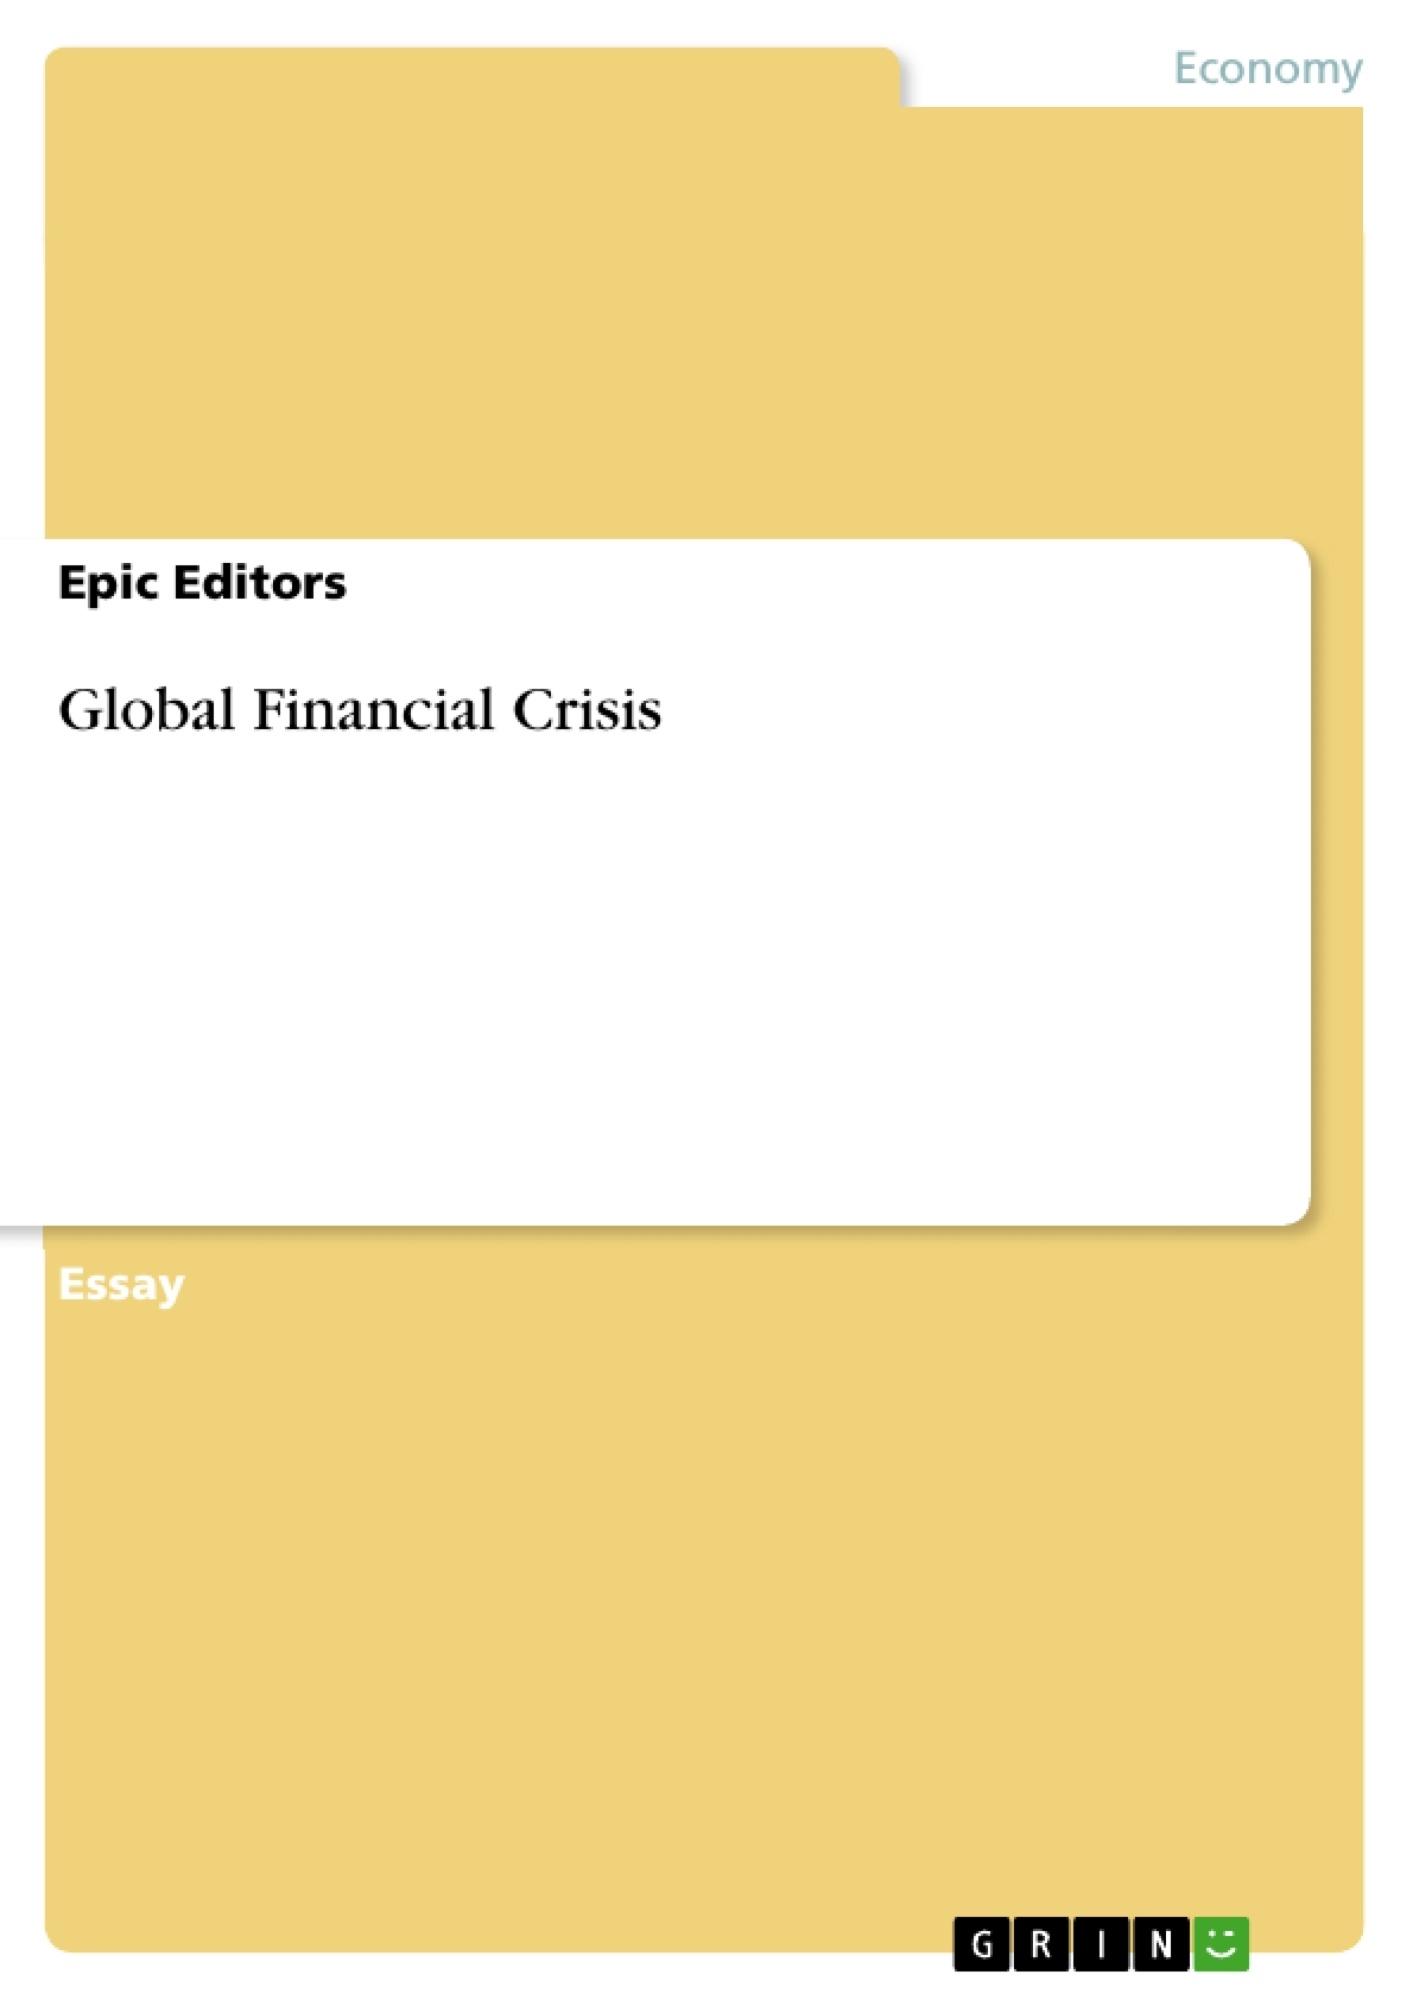 Title: Global Financial Crisis